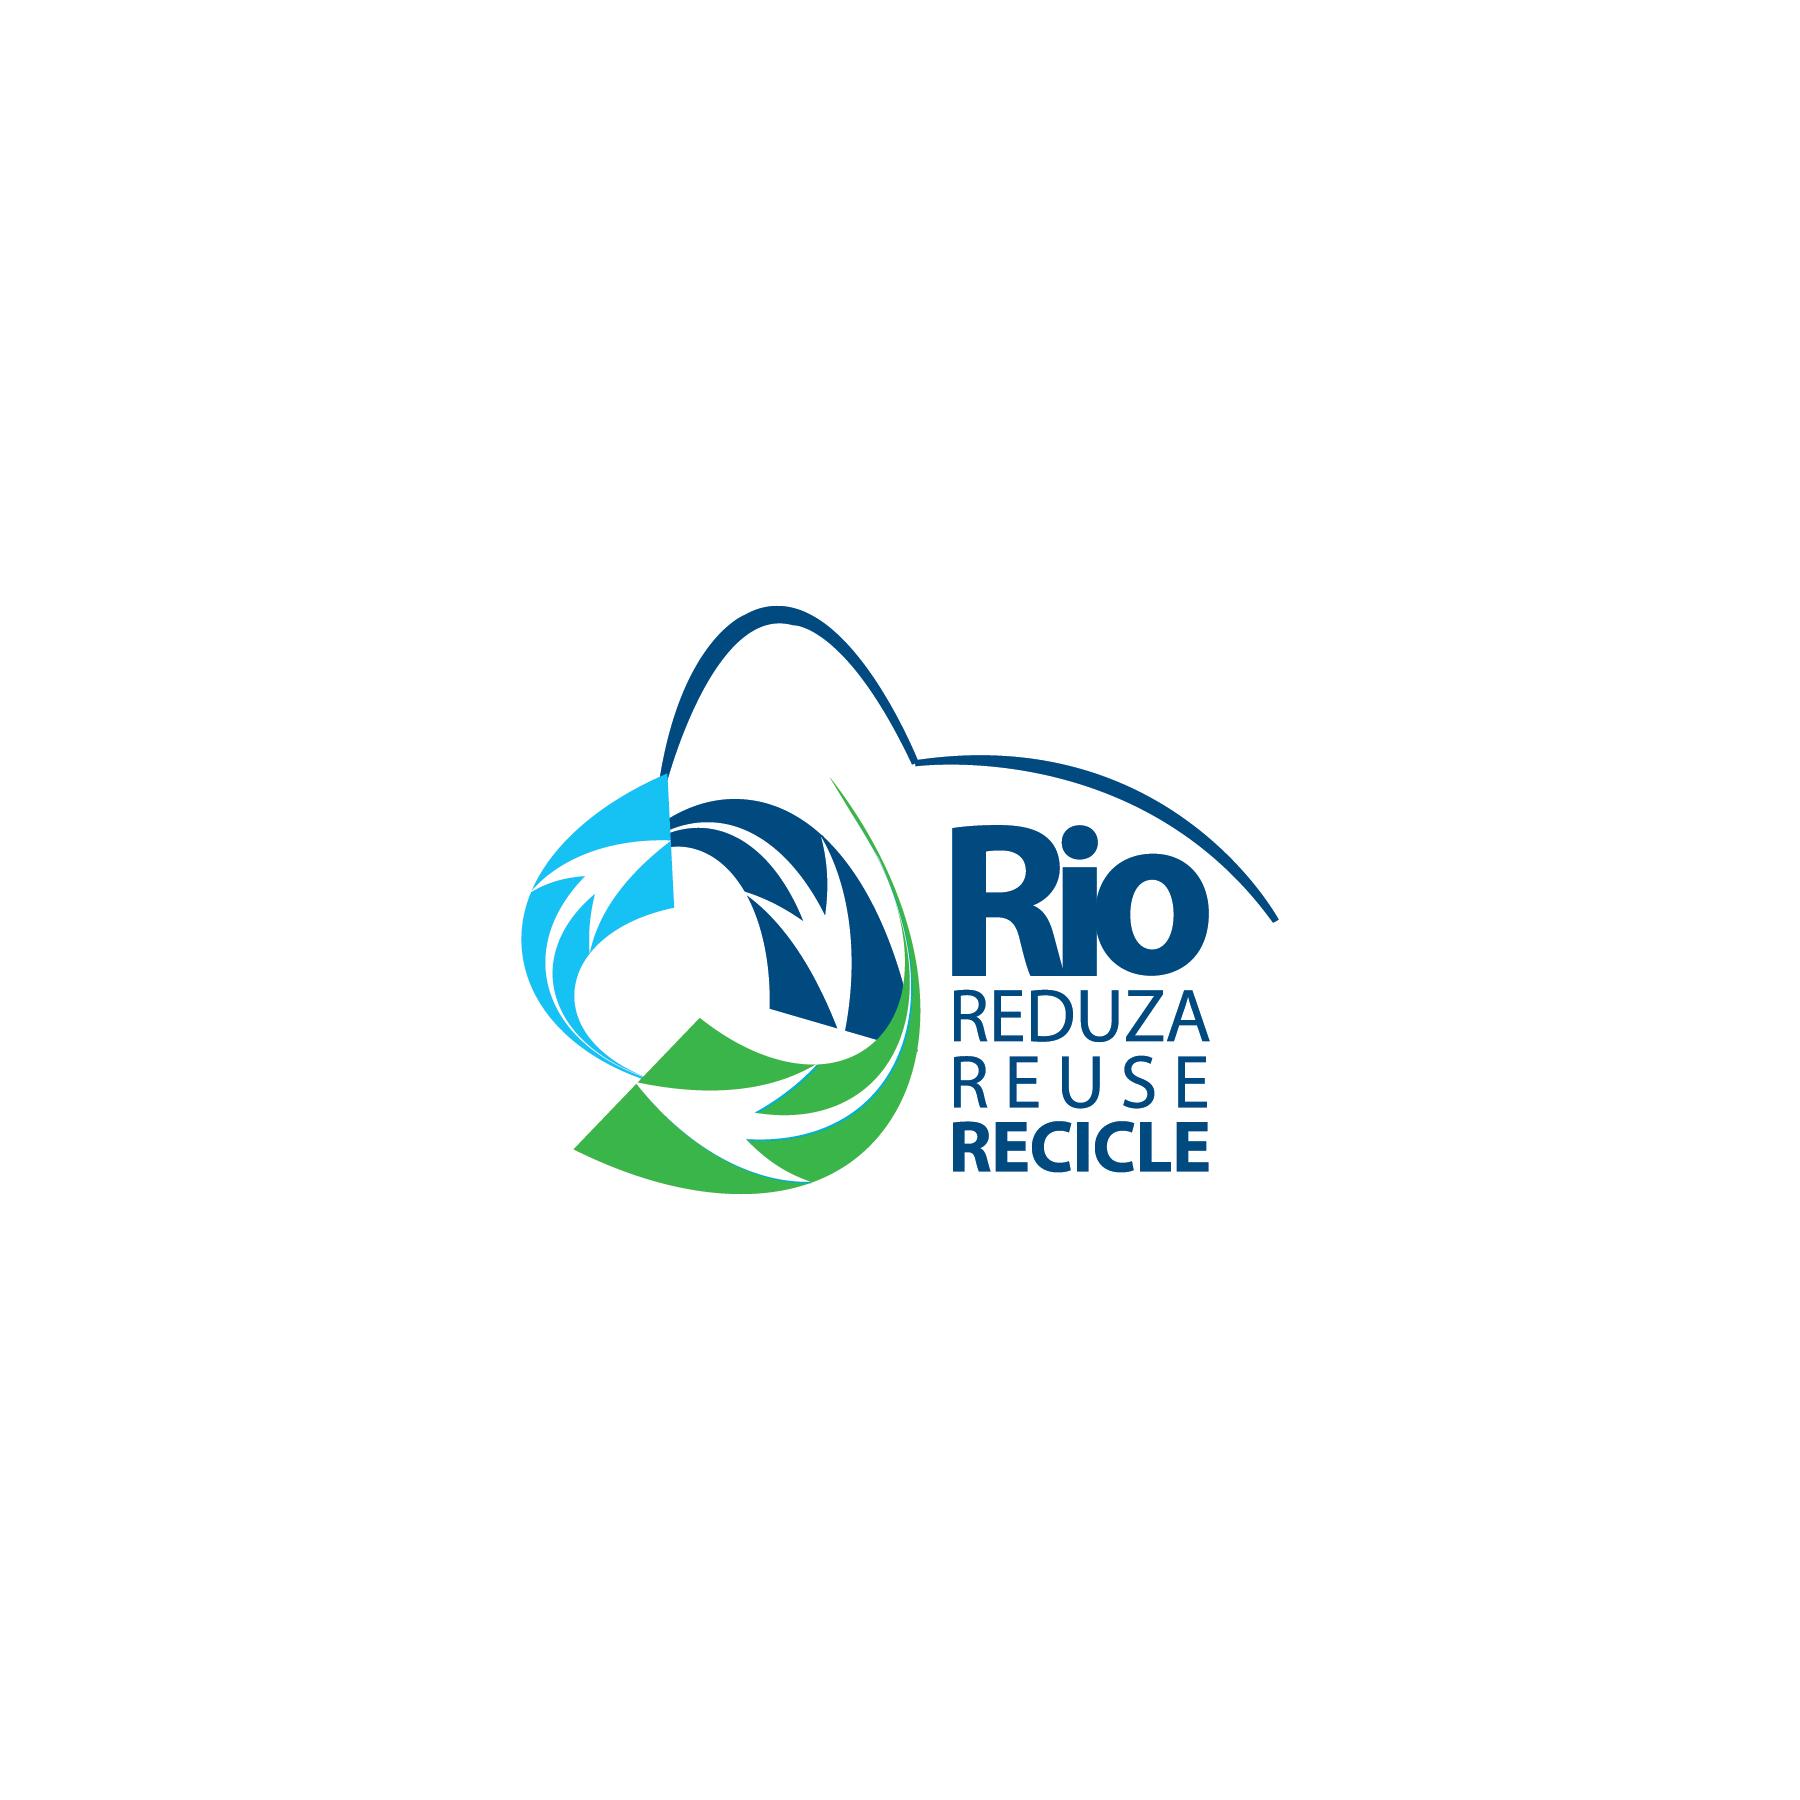 RIO REDUZA REUSE